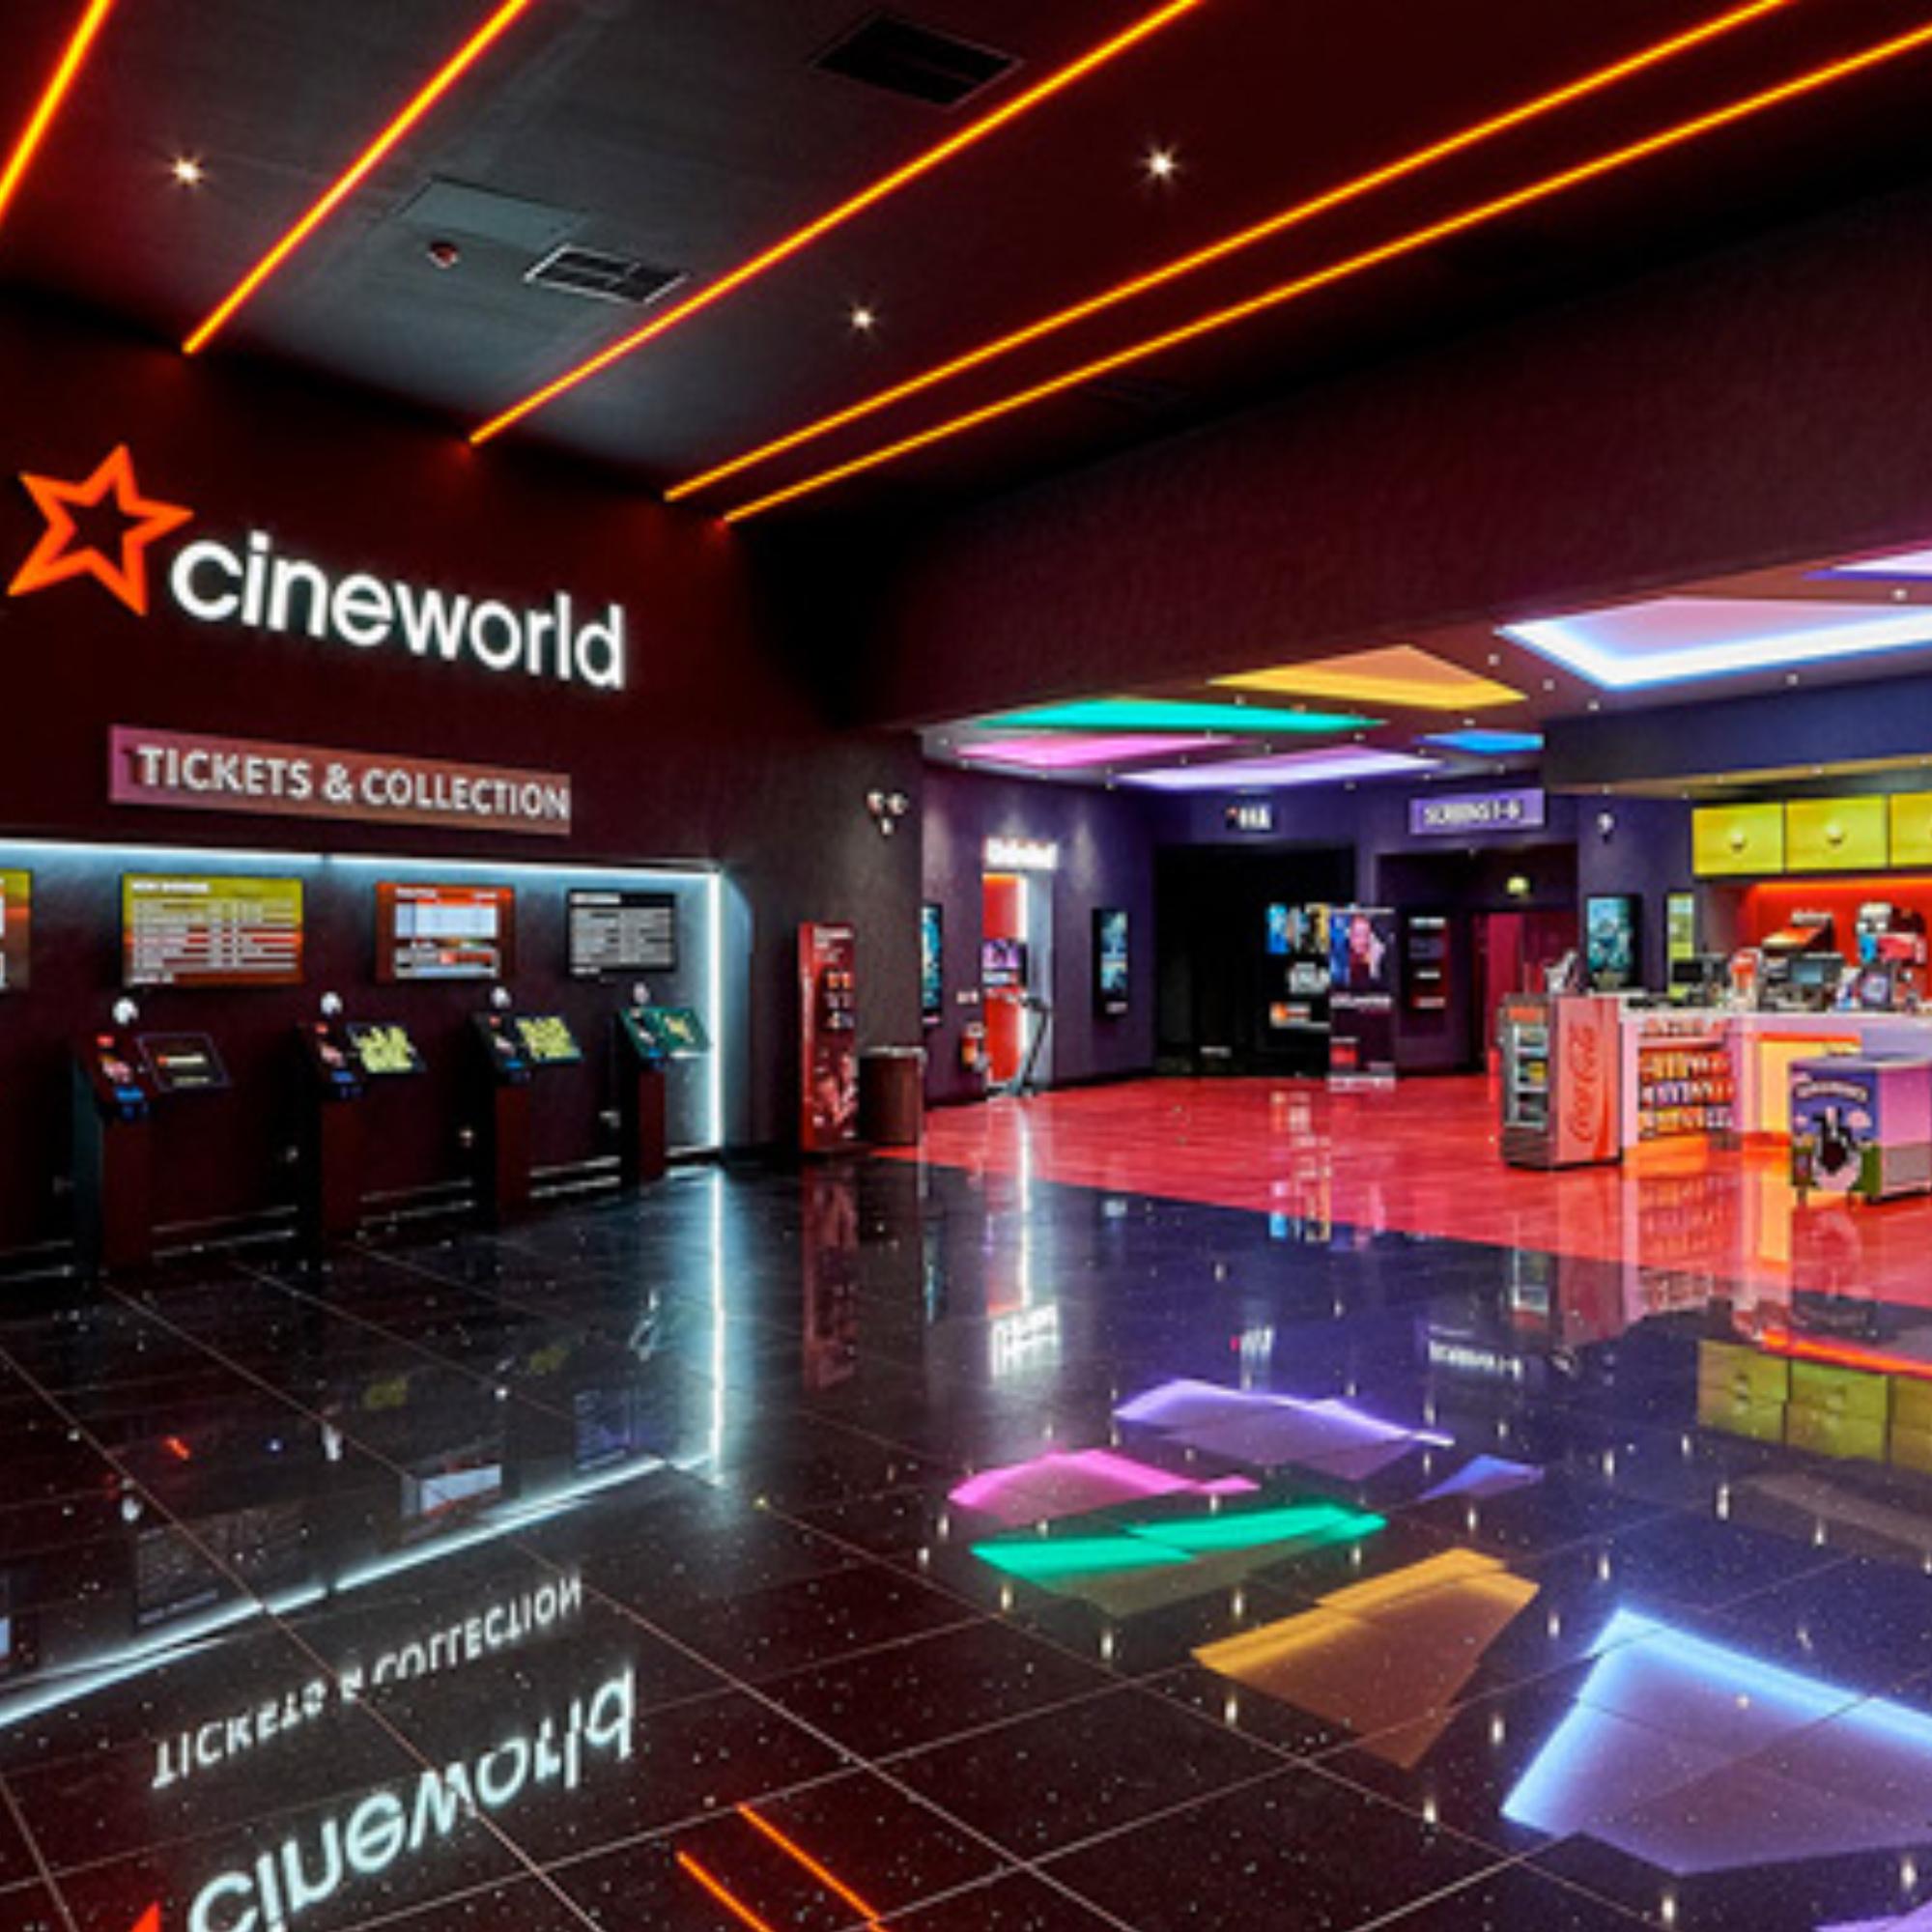 Cineworld Cinemas, Cardiff & Newport - 1